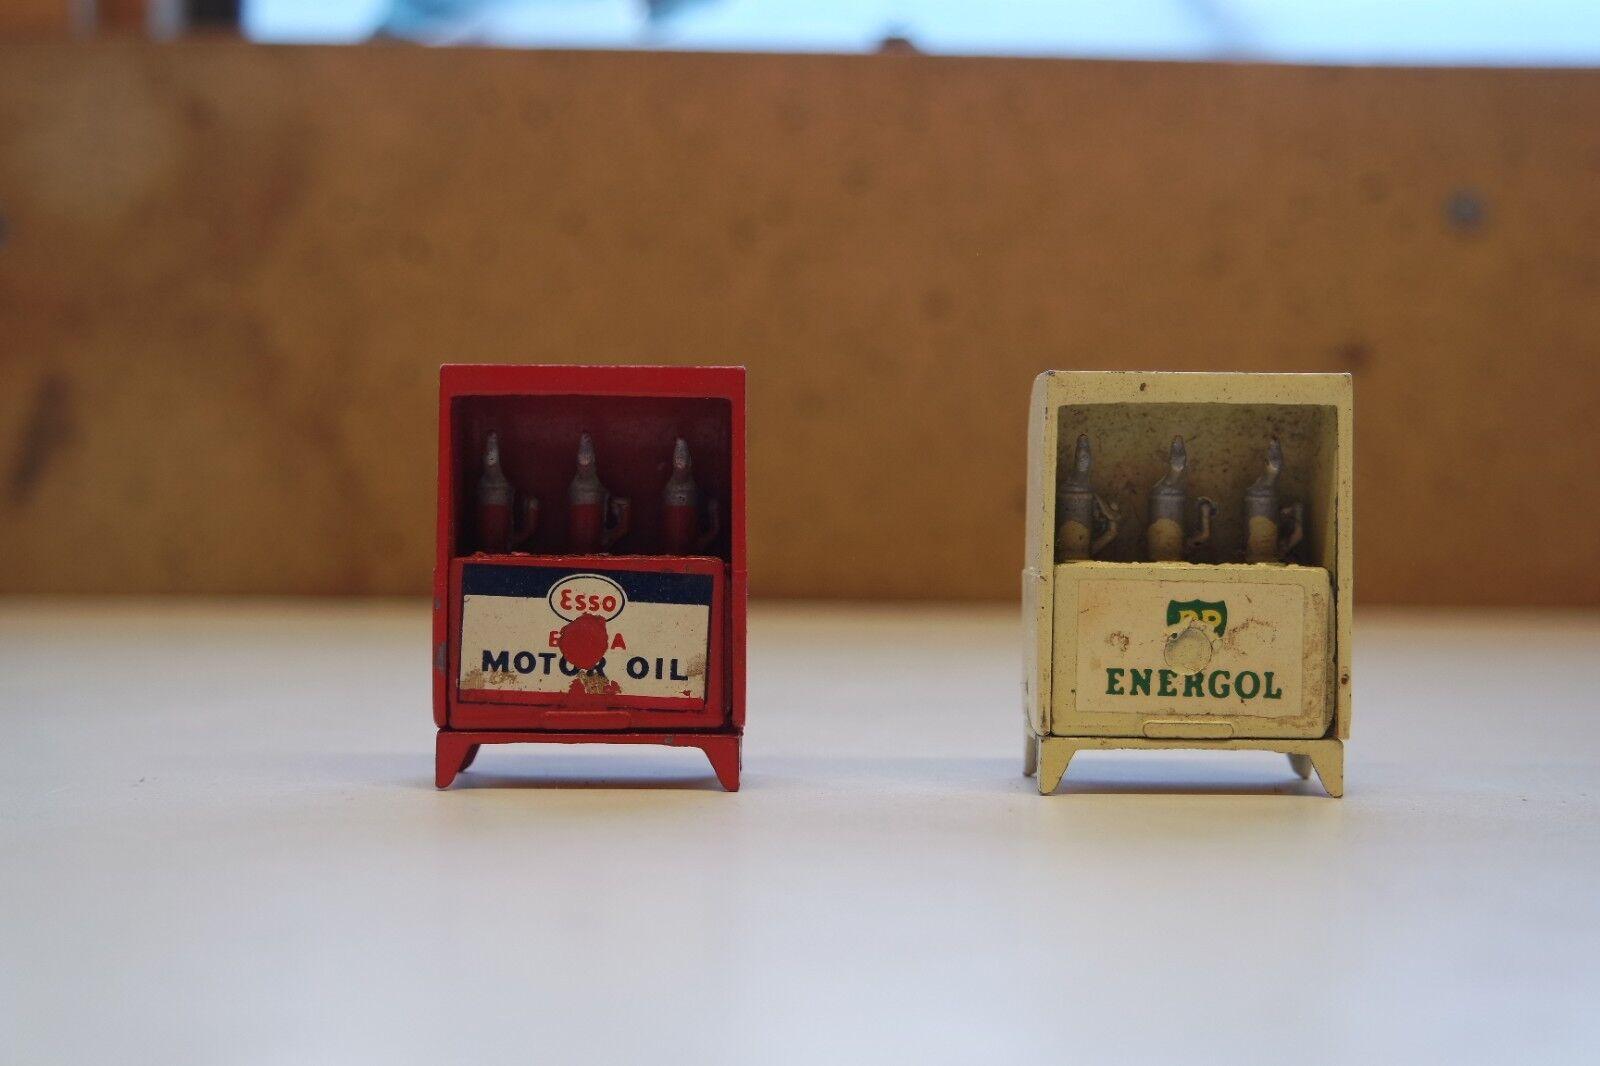 2. jahrgang nähe öl auf druckguss kabinett 1 x bp energol 1 x esso extra